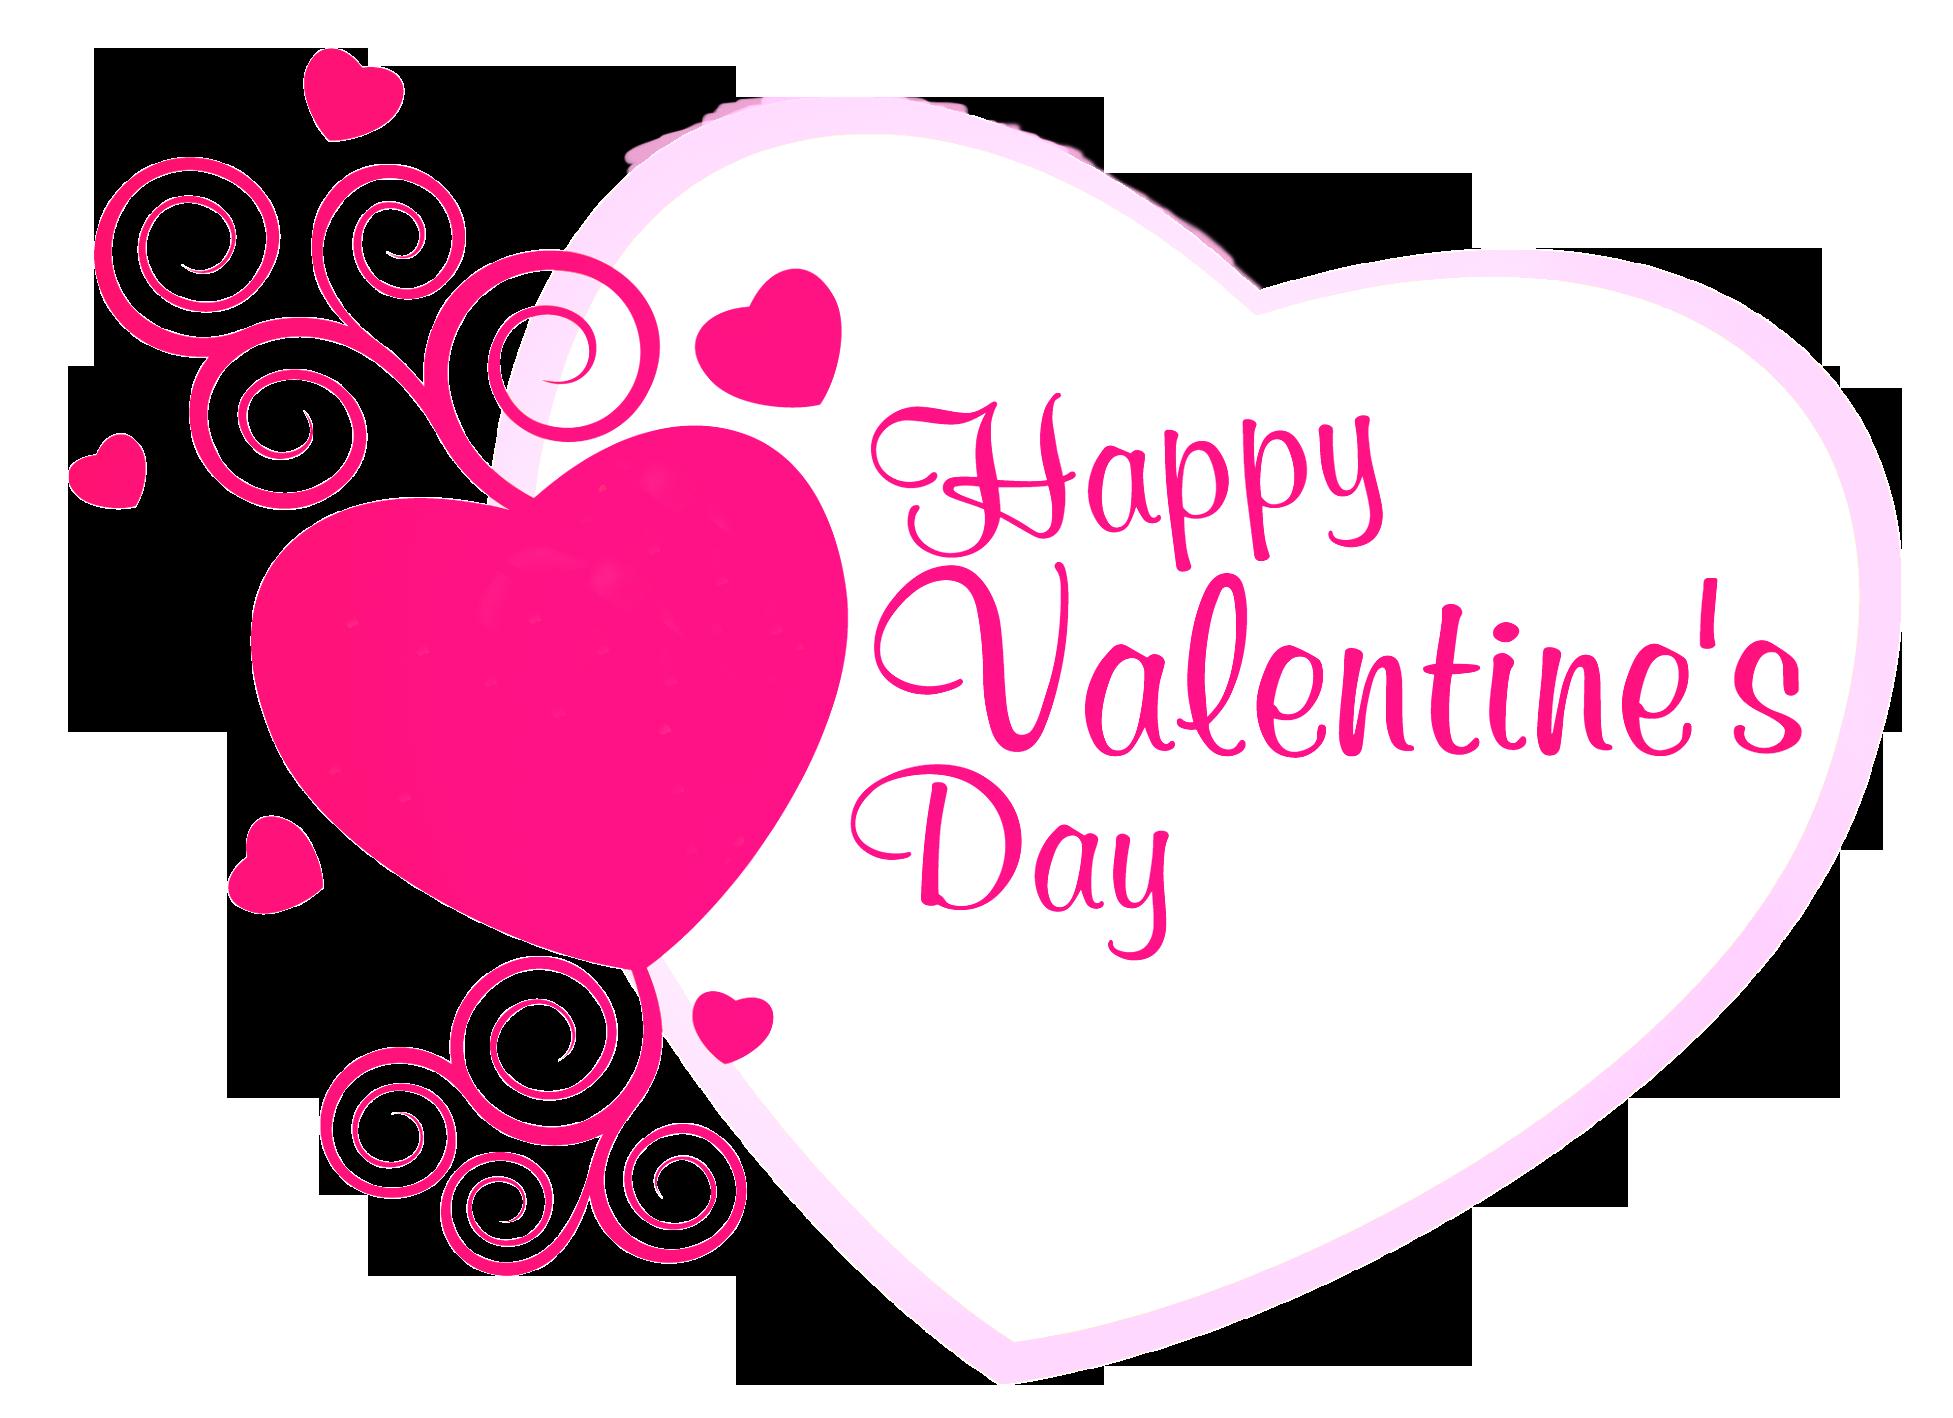 Valentines day hearts happy .-Valentines day hearts happy .-7